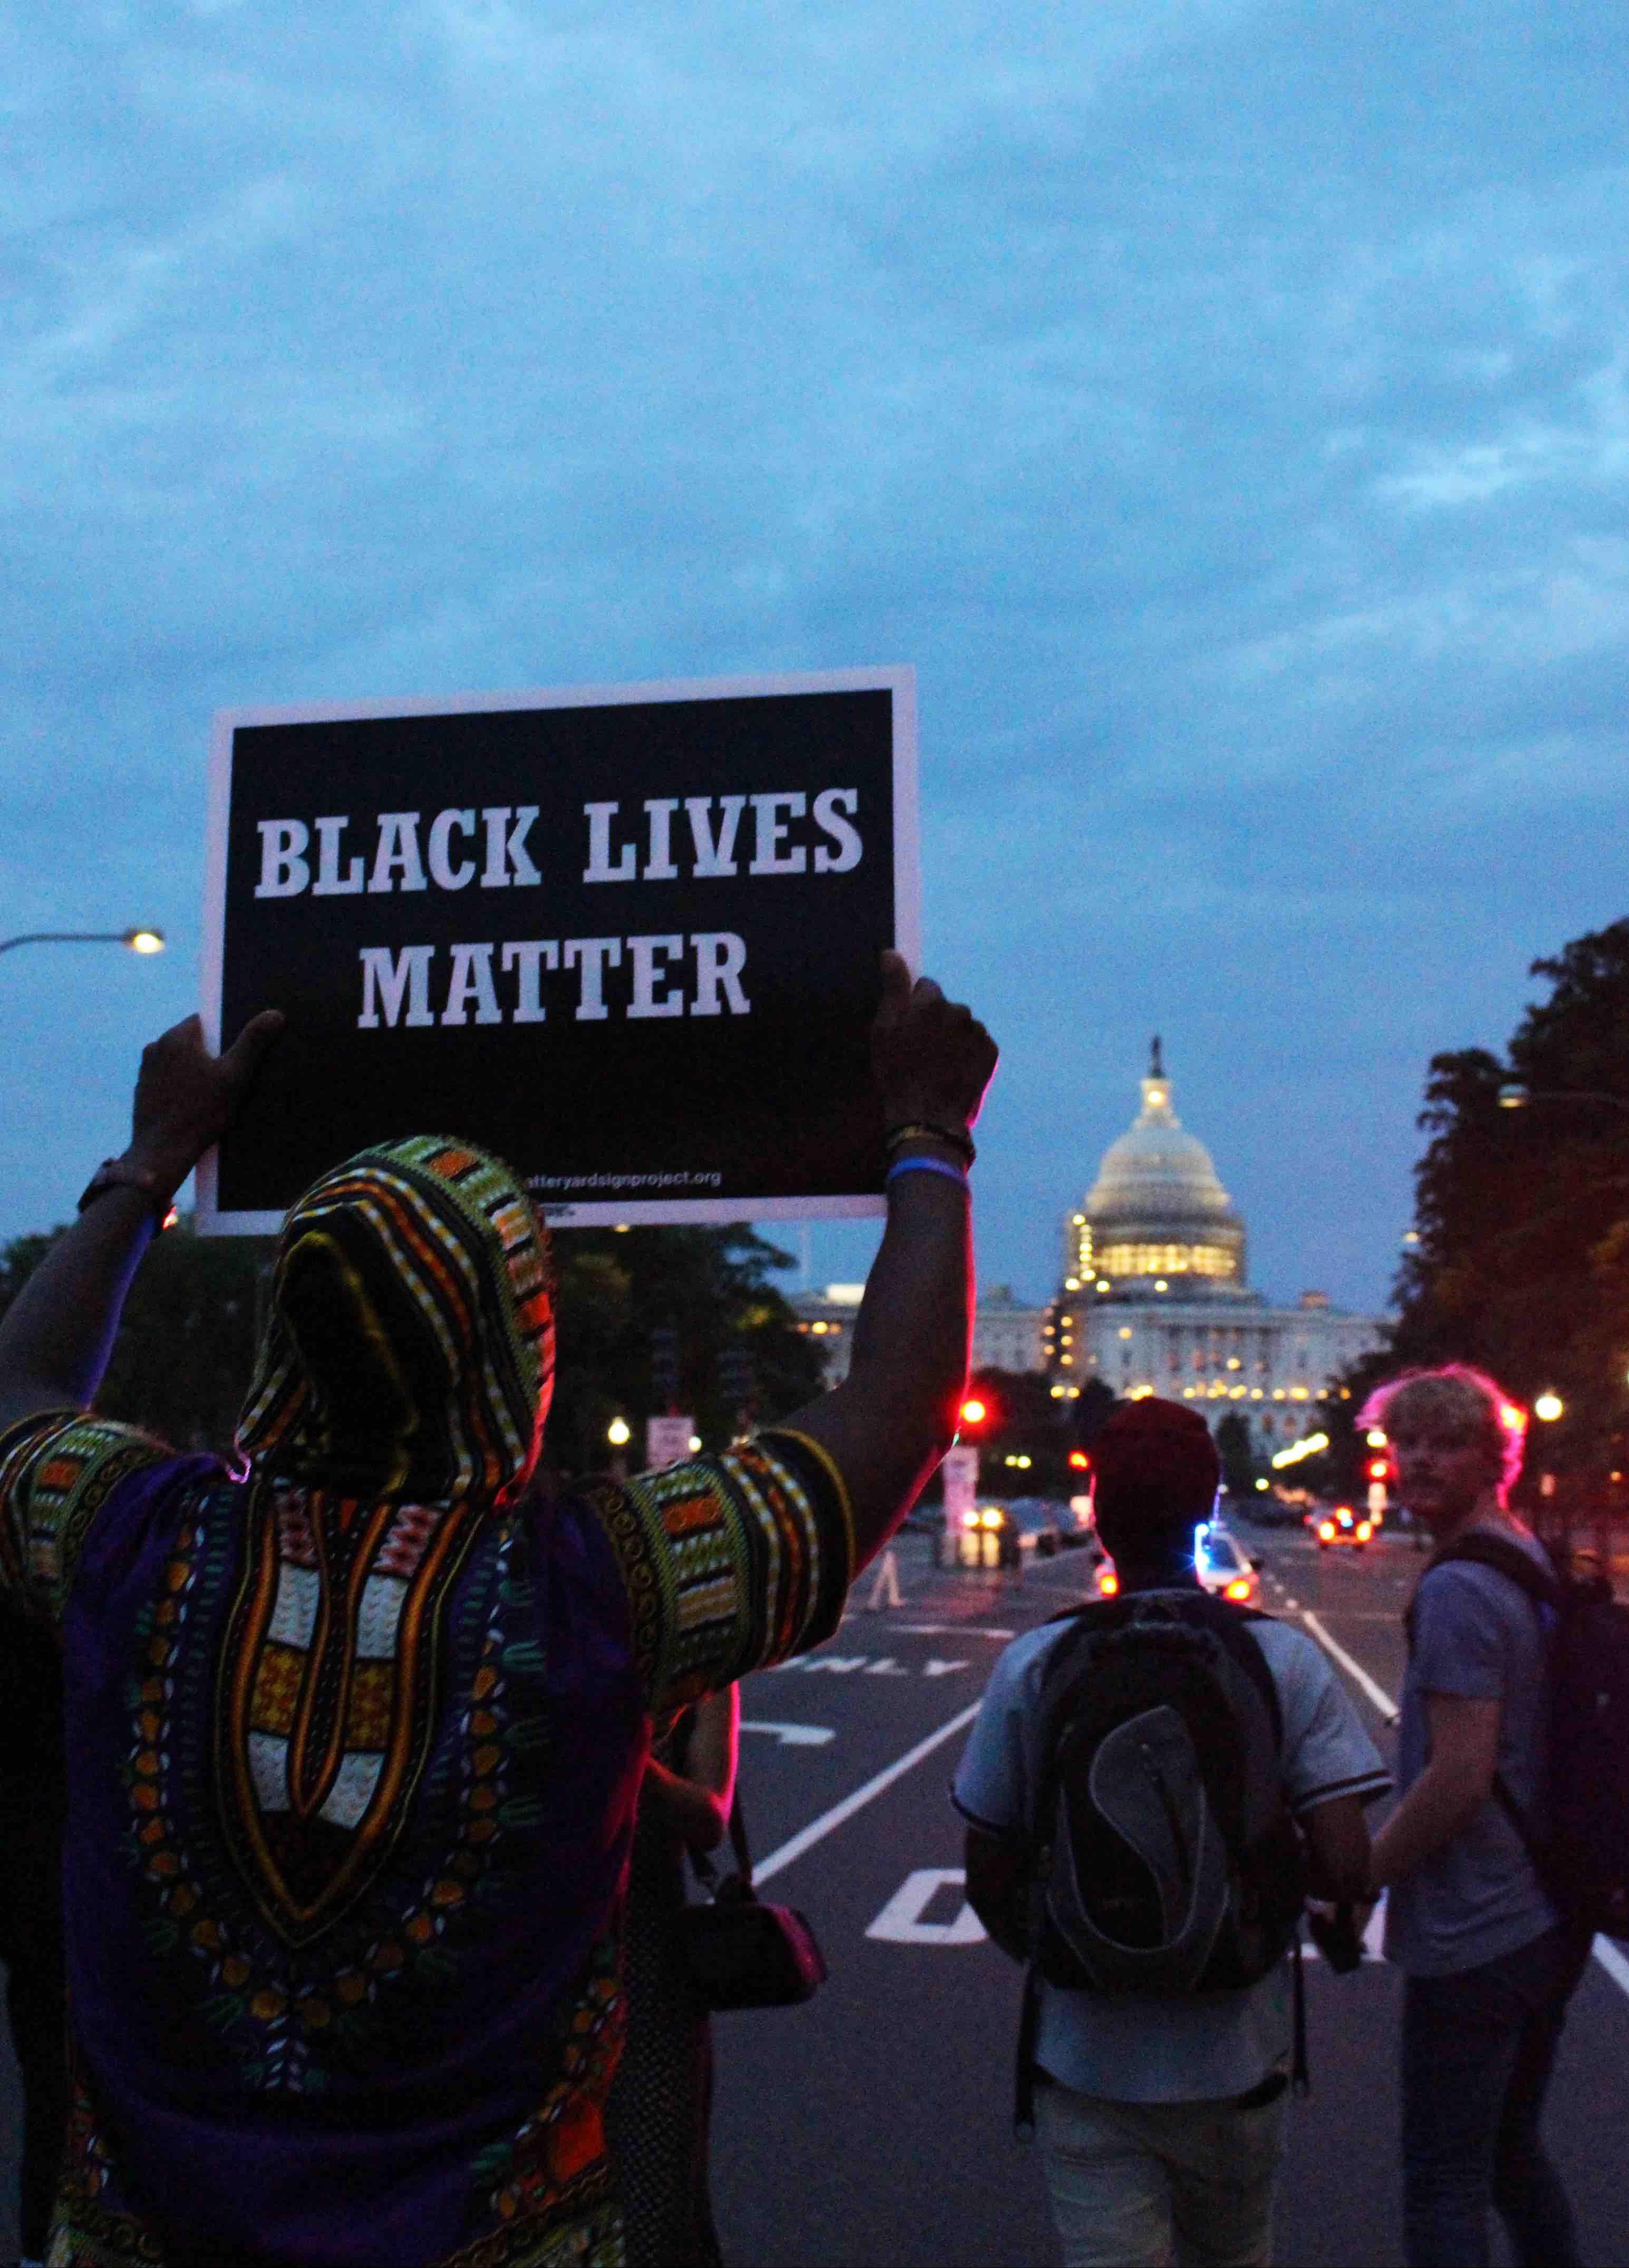 Black Lives Matter at the US capitol